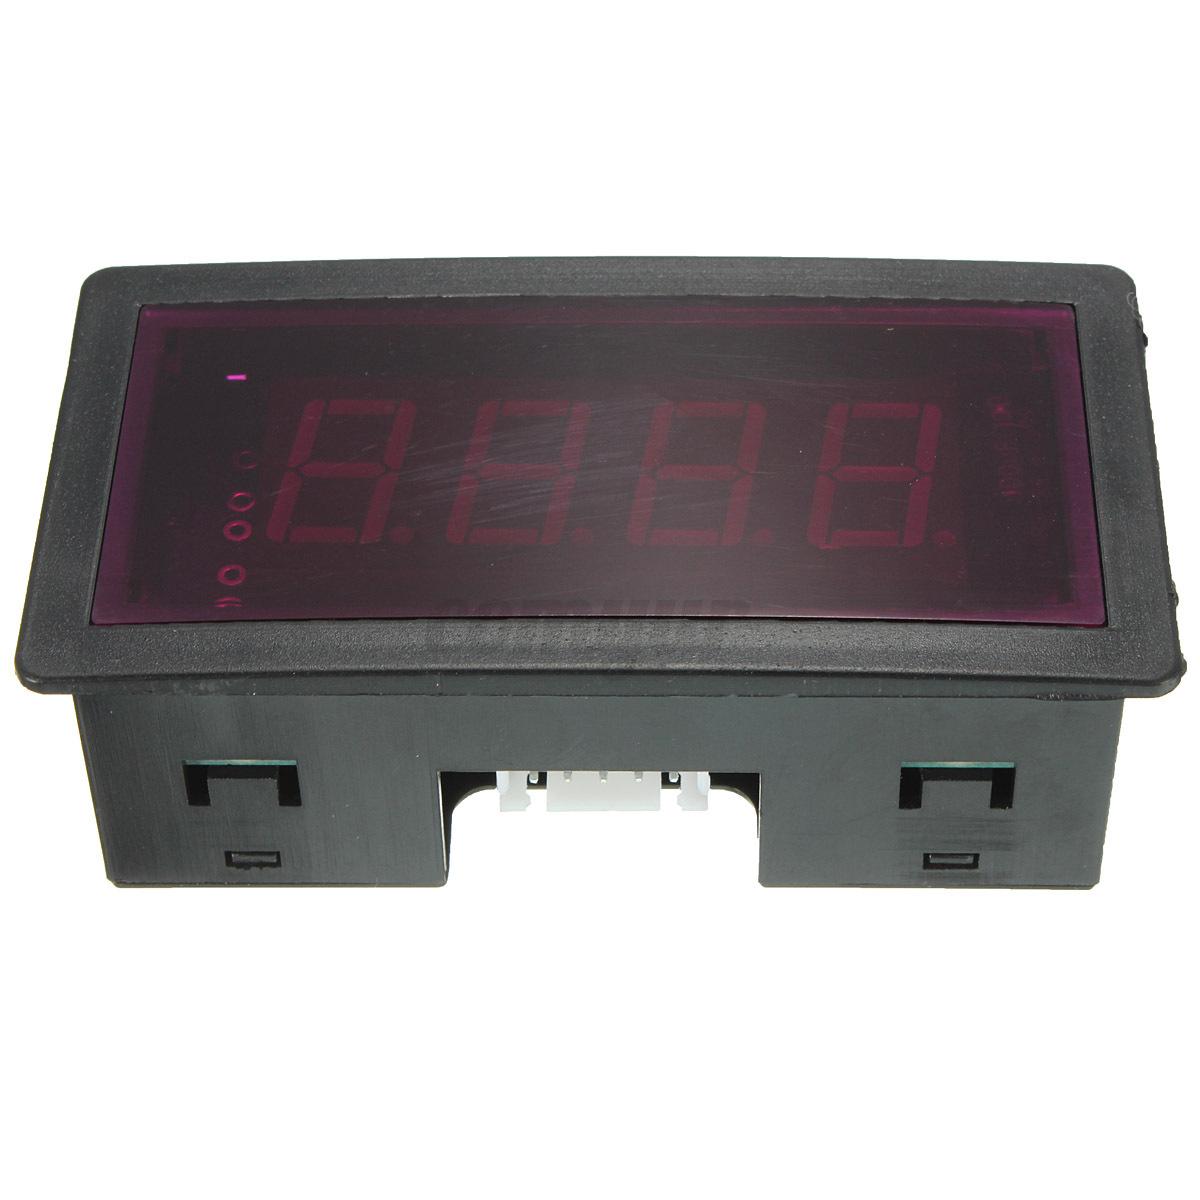 Tachometer Circuit Based On The Magnetic Sensor Sensorcircuit